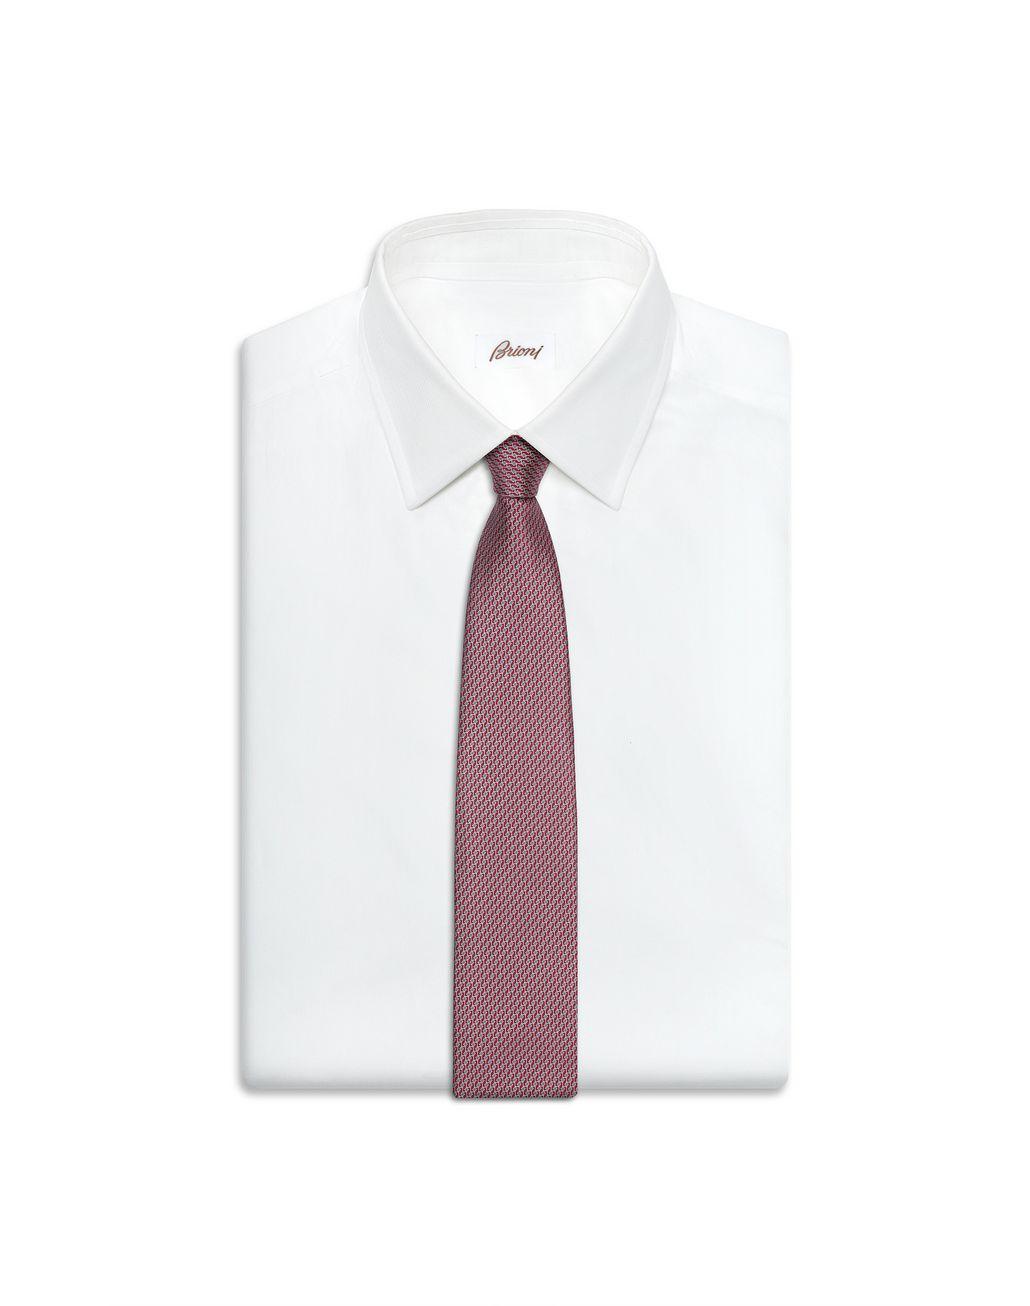 BRIONI Red and Navy Blue Micro Design Tie Set Tie & Pocket Square [*** pickupInStoreShippingNotGuaranteed_info ***] e